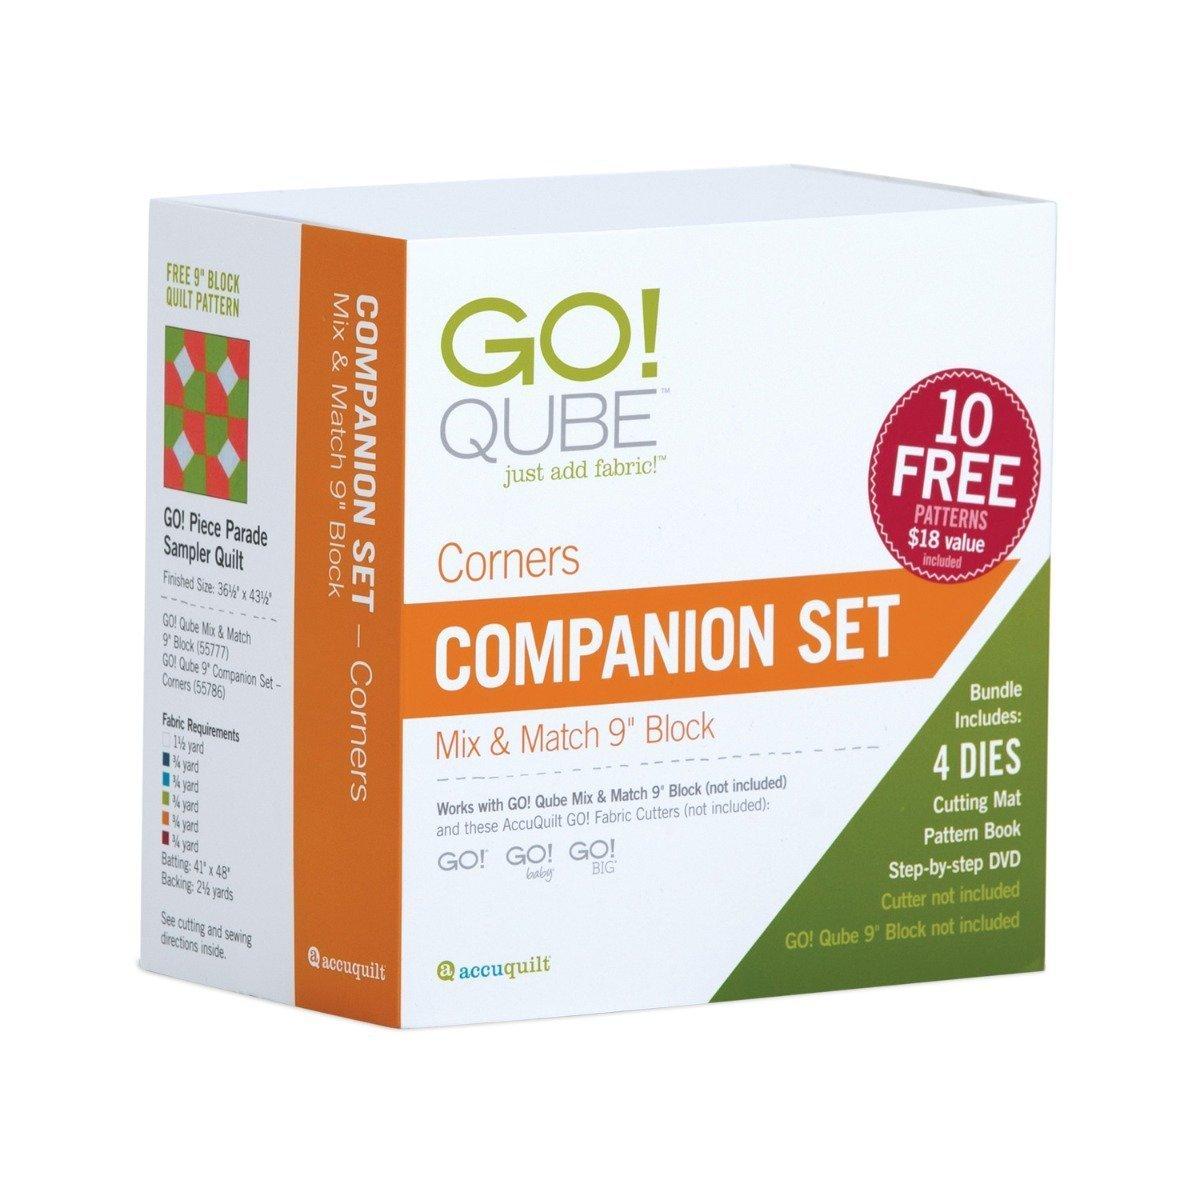 GO! Qube 9 Companion Set -Corners